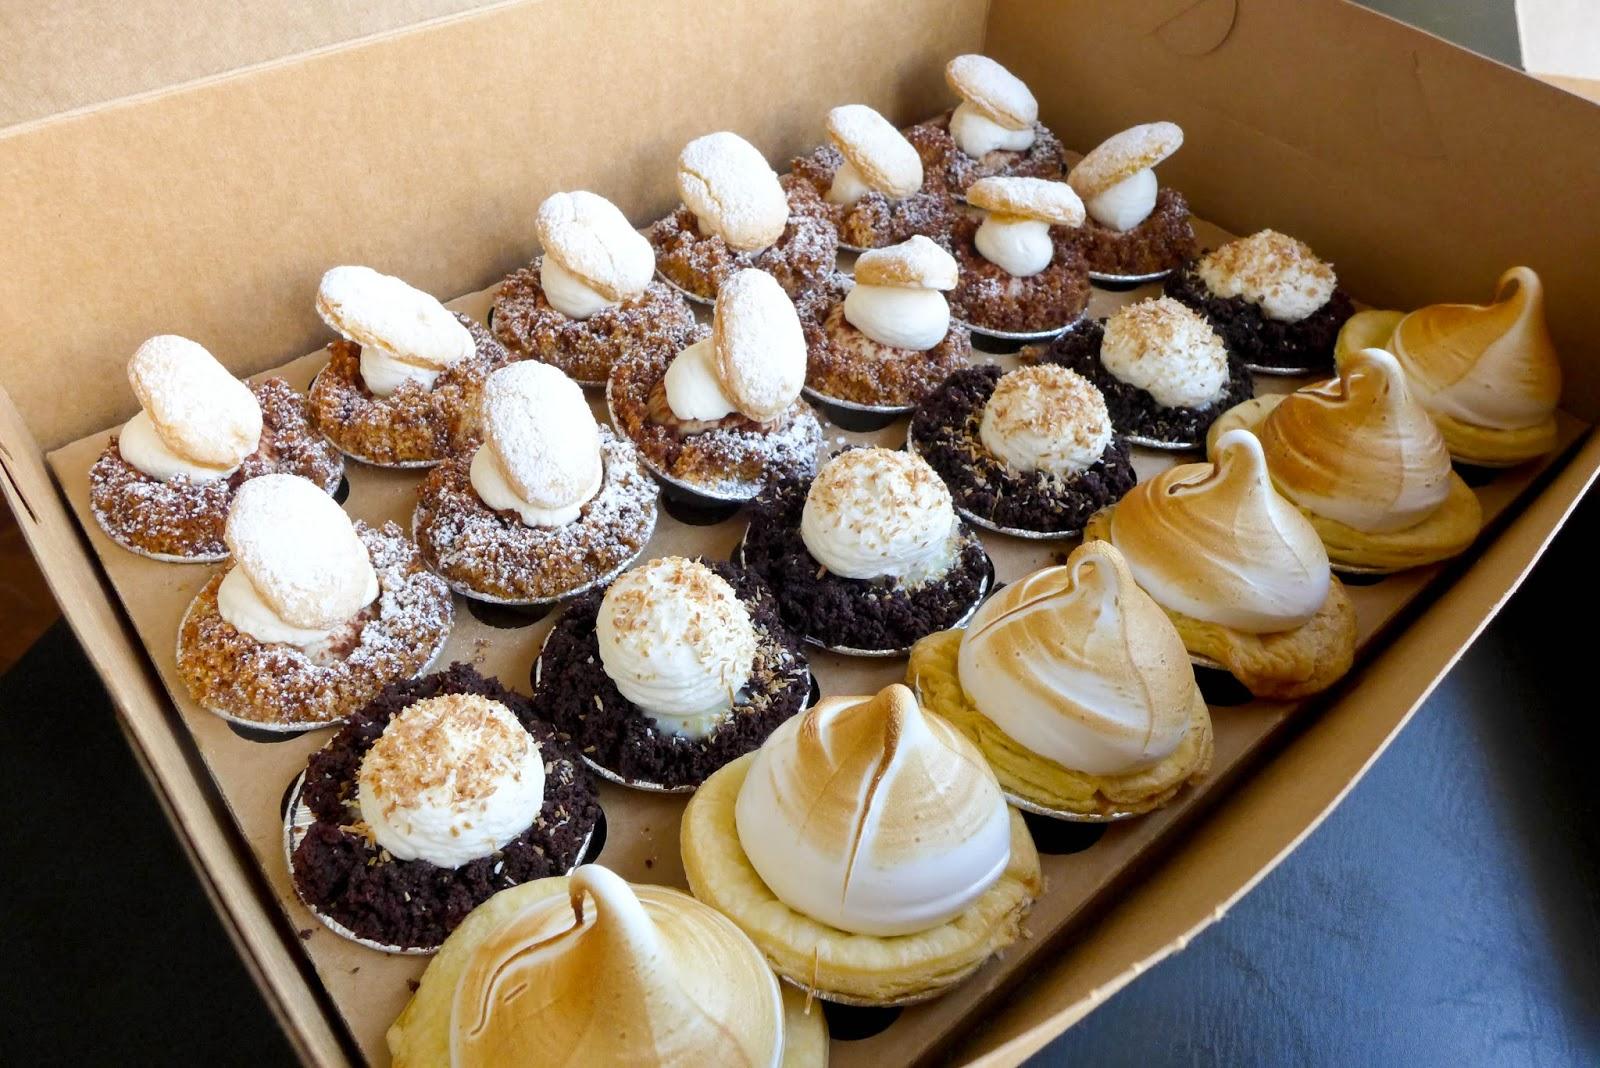 Rustique Pie Kitchen - Tiramisu, Snowball White Chocolate Coconut, Lemon Meringue Pie